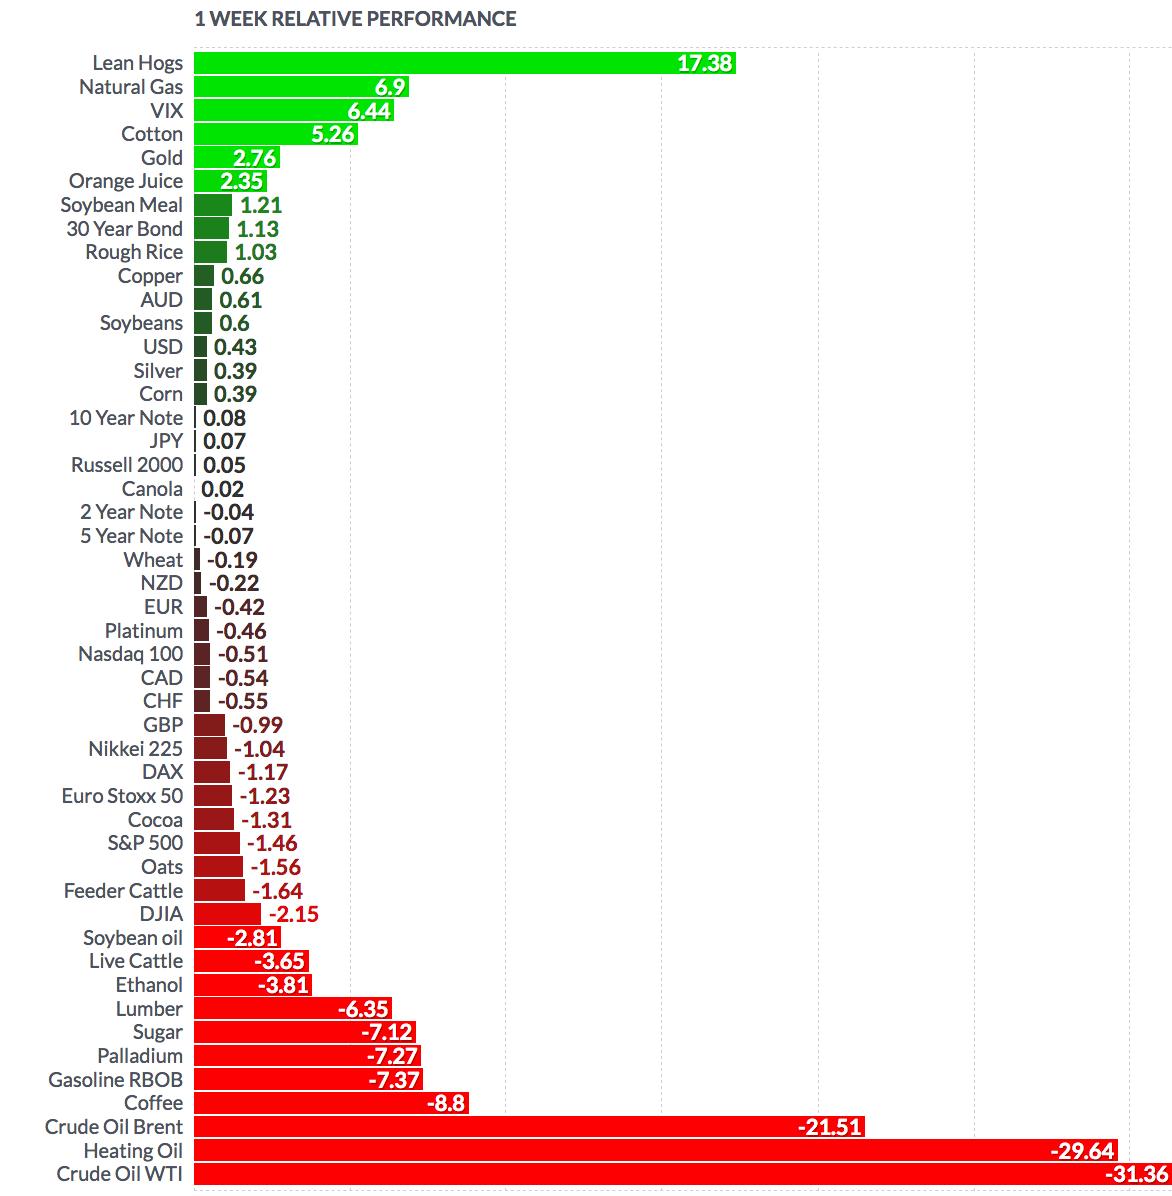 Futures - 1 Week Relative Performance